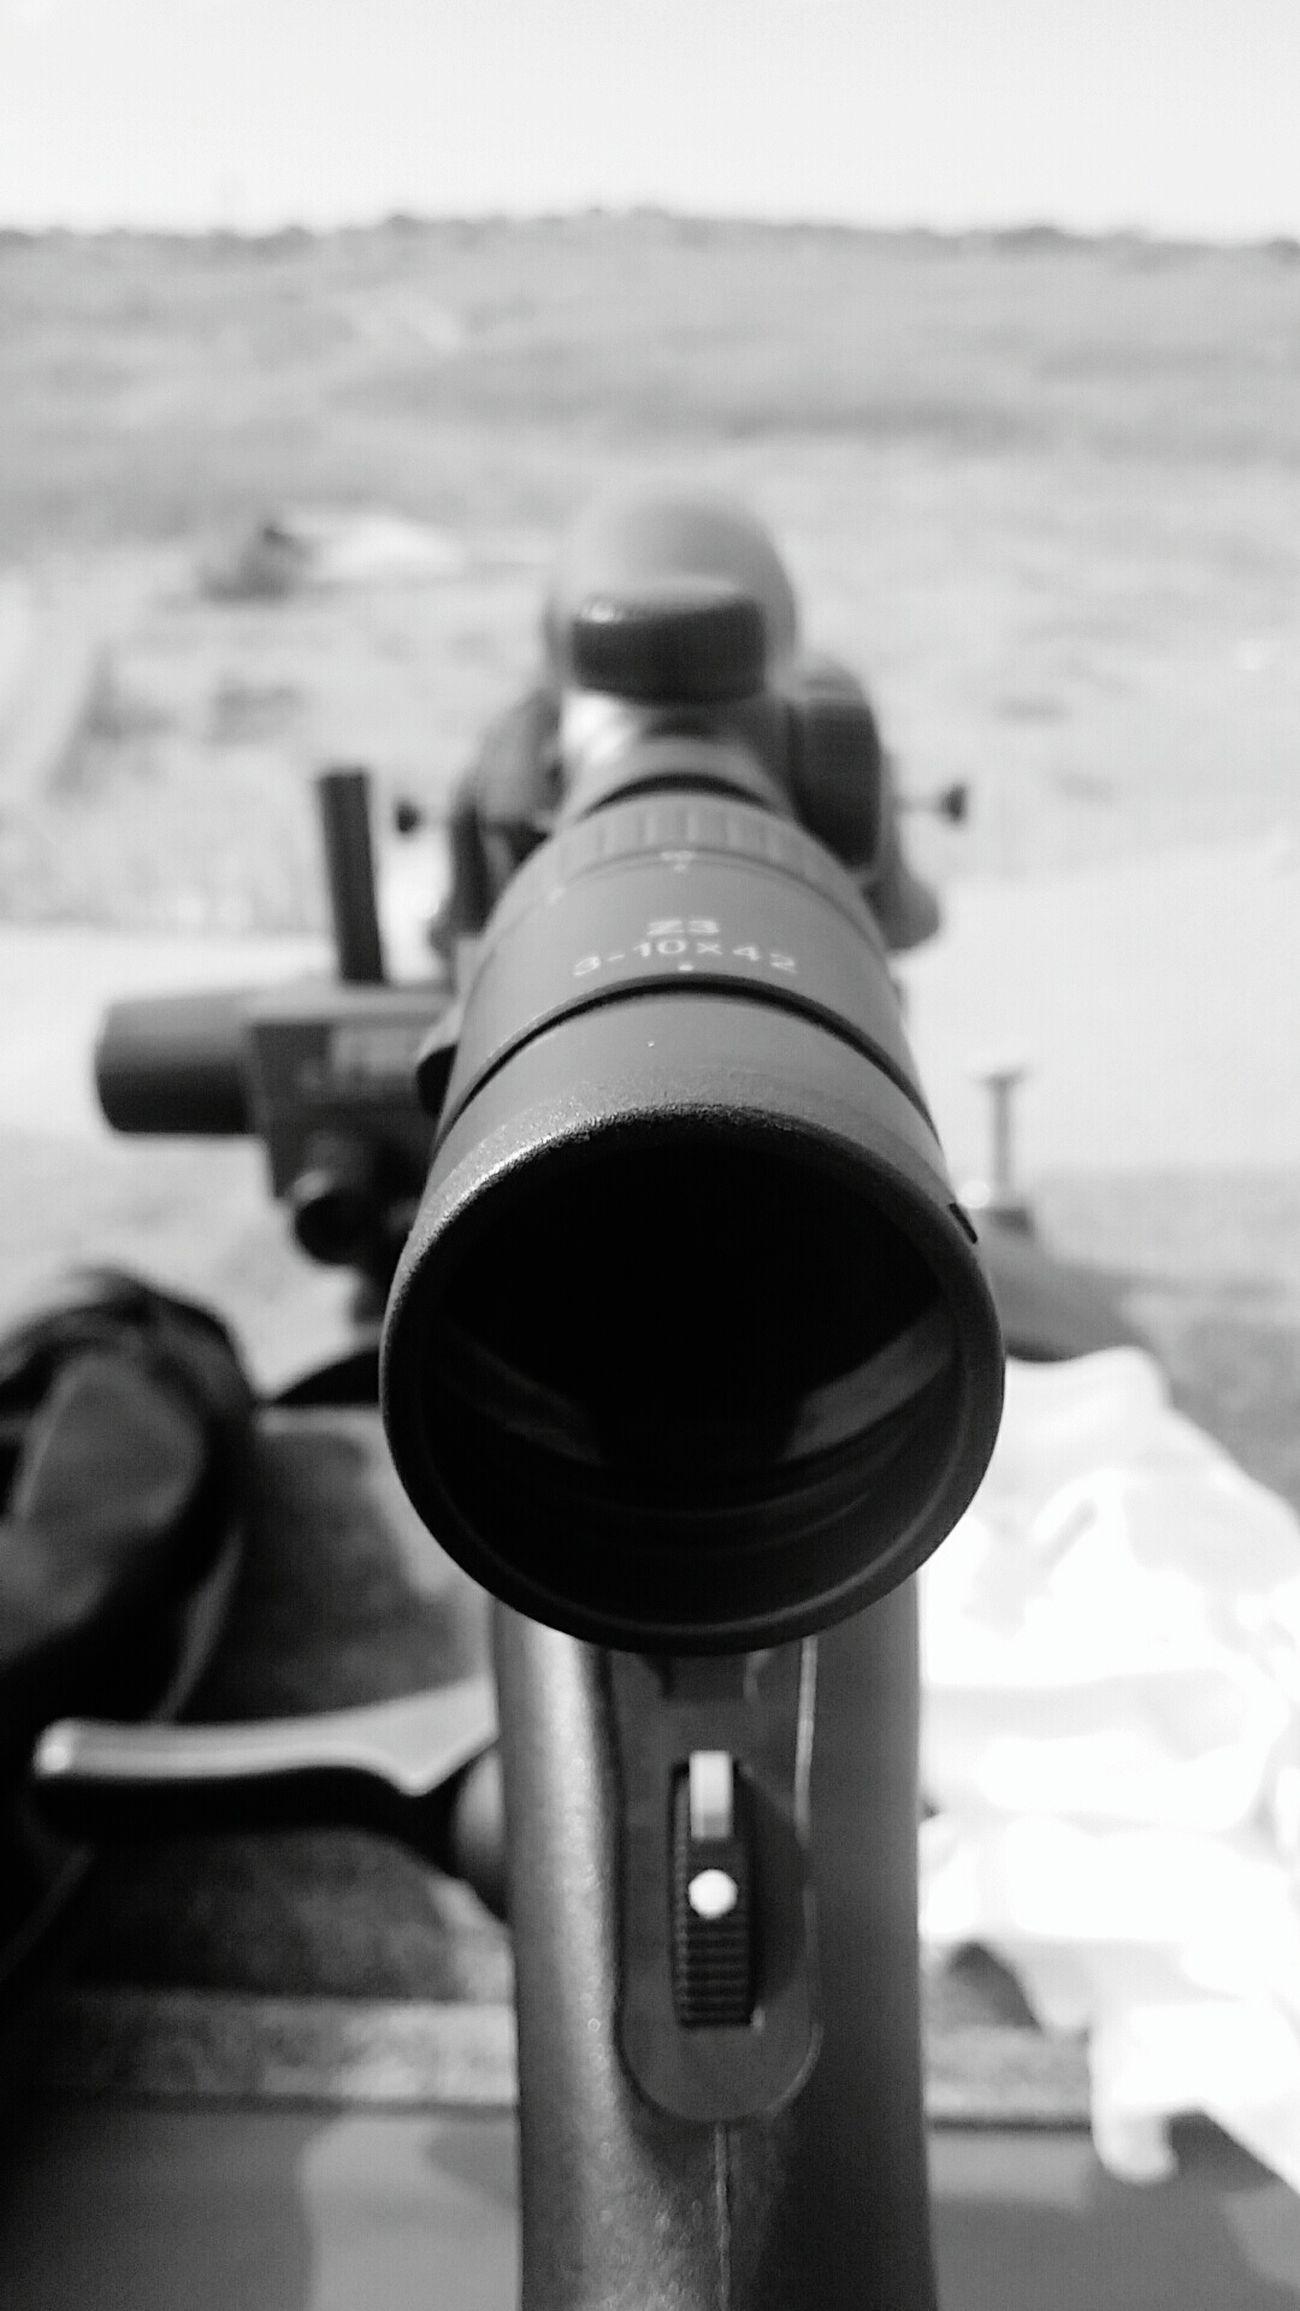 Focus On Foreground Close-up Outdoors Black & White Rifle Scope Shooting Range  Bullseye